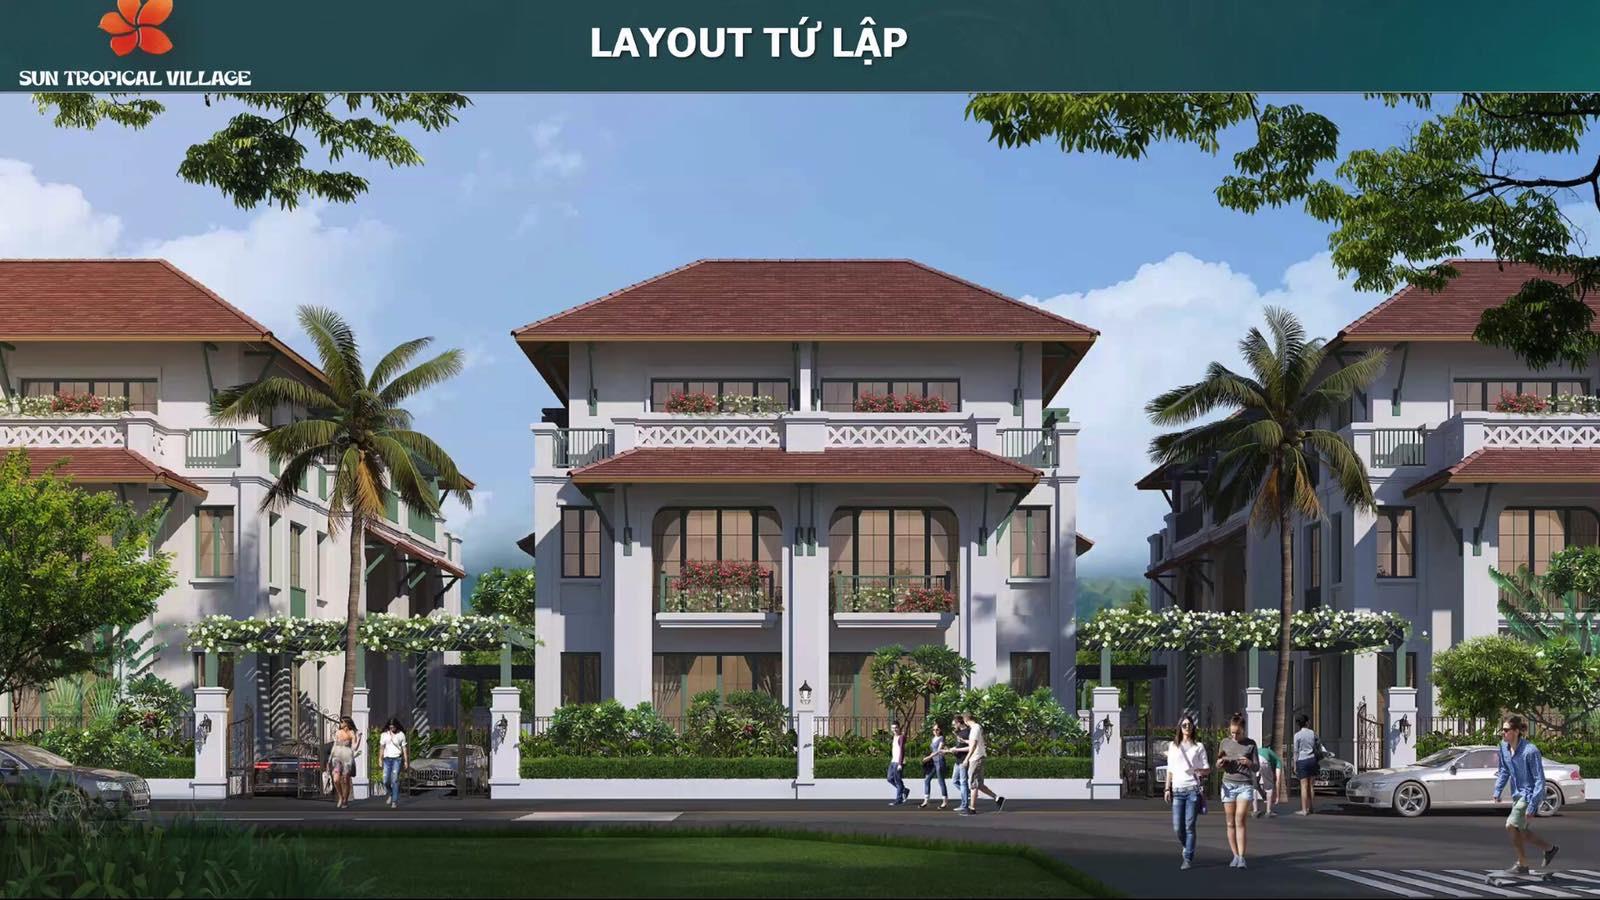 Layout biệt thự mẫu Sun Tropical Village Phú Quốc 10